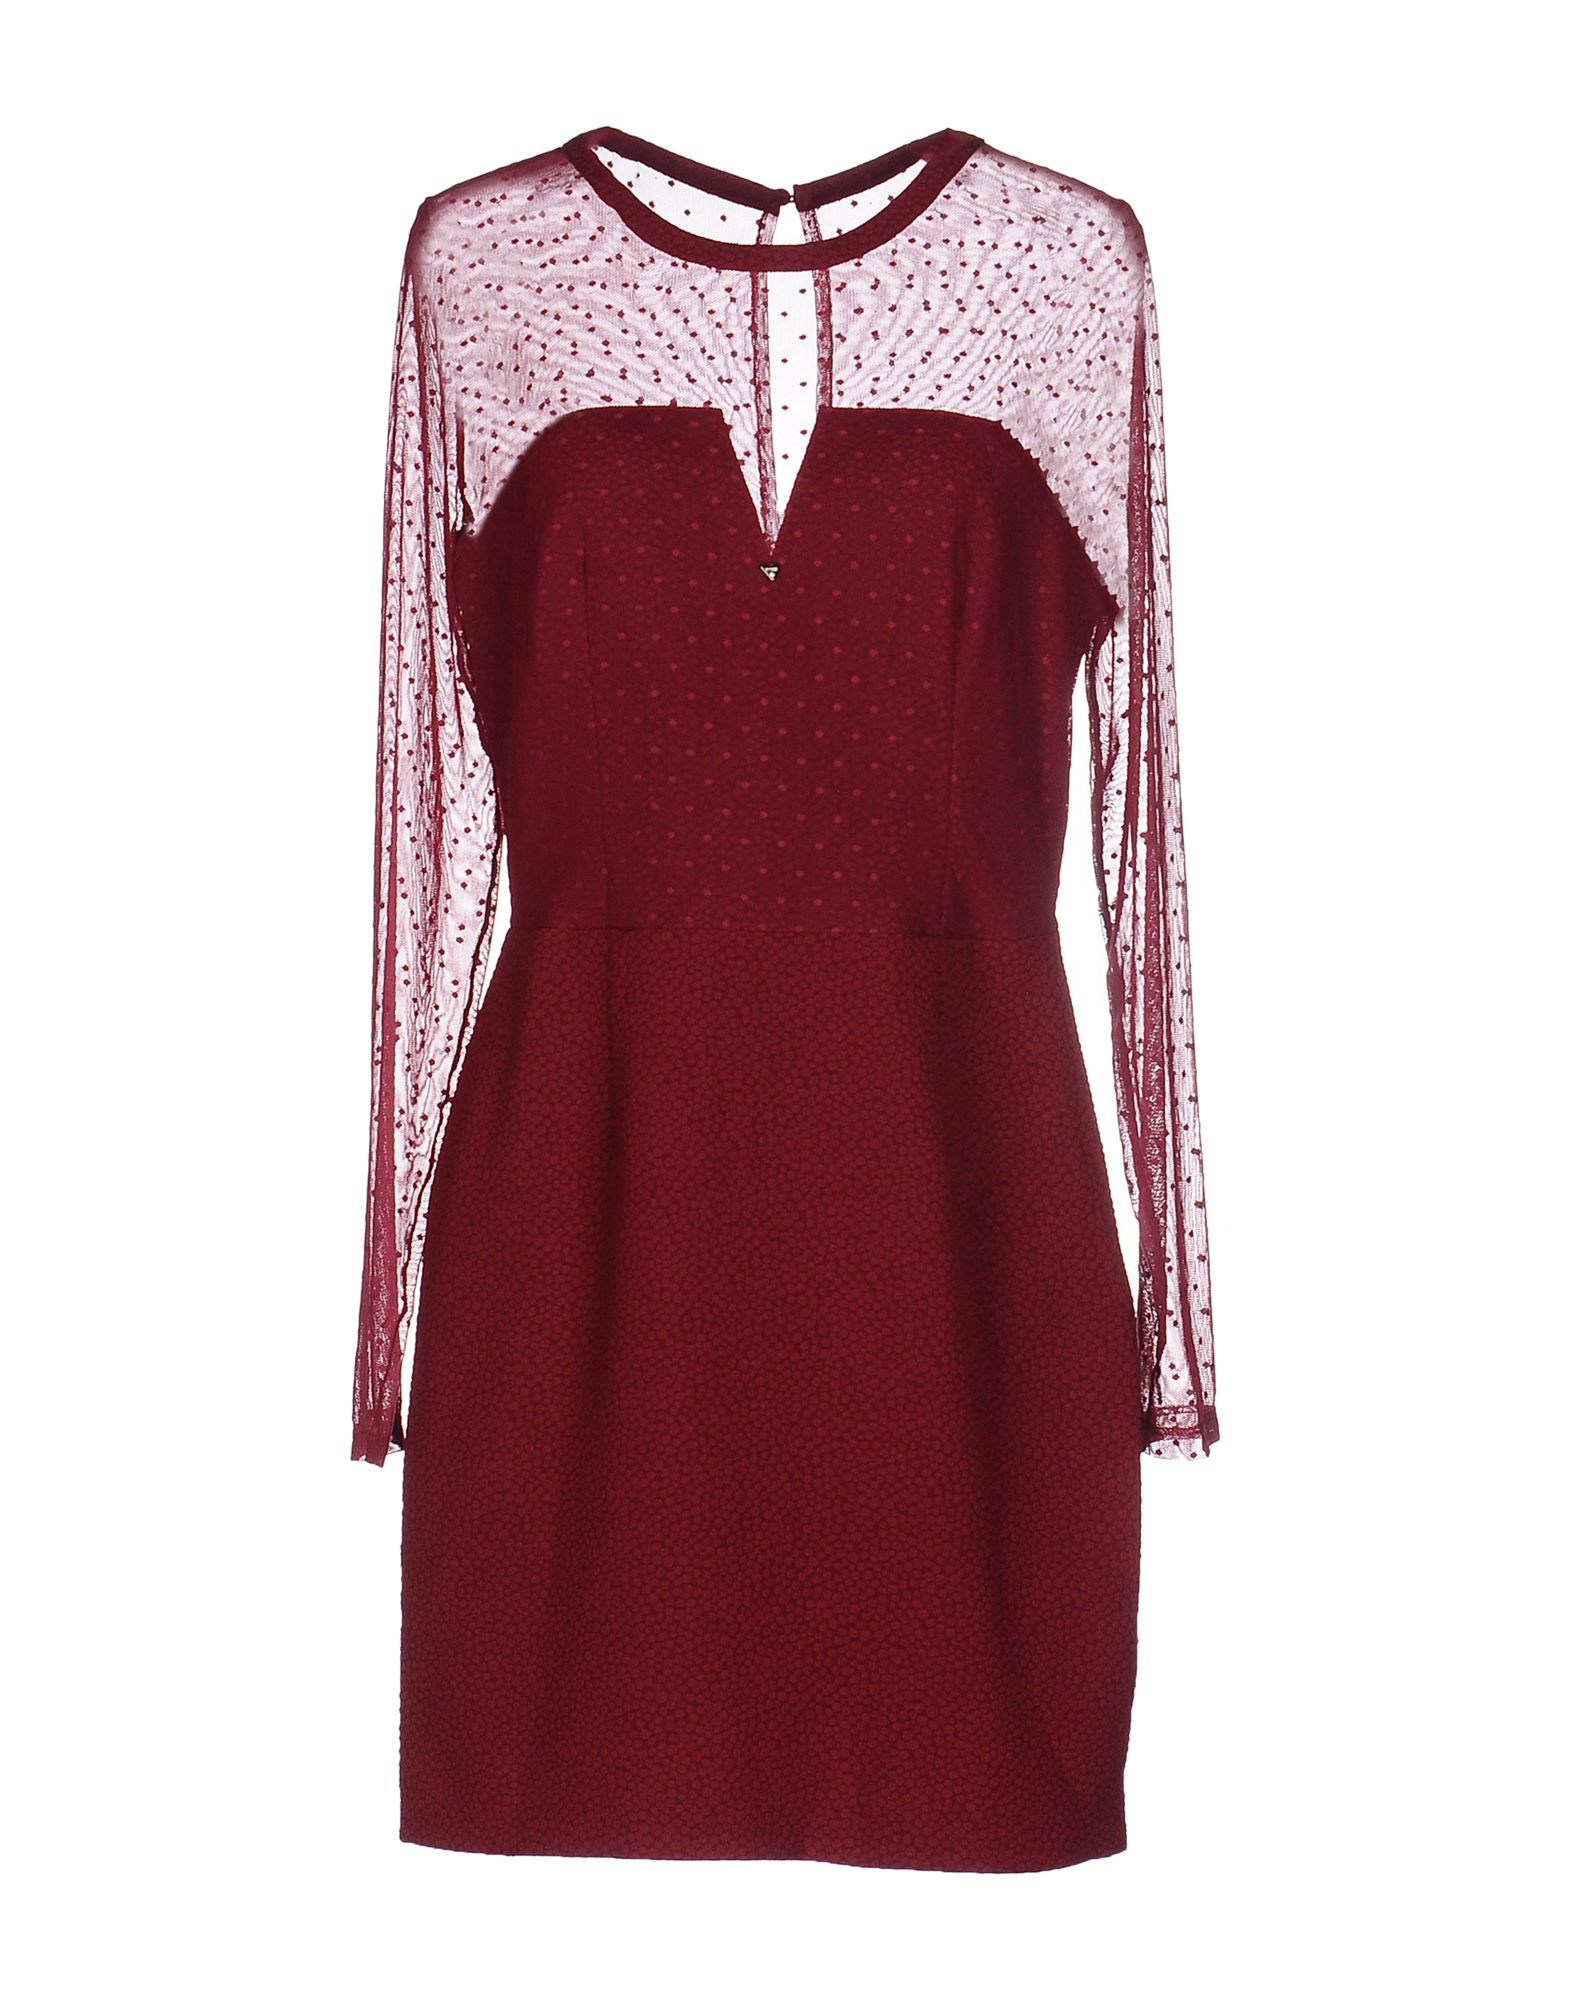 GUESS Damen Kurzes Kleid Farbe Purpur Größe 5